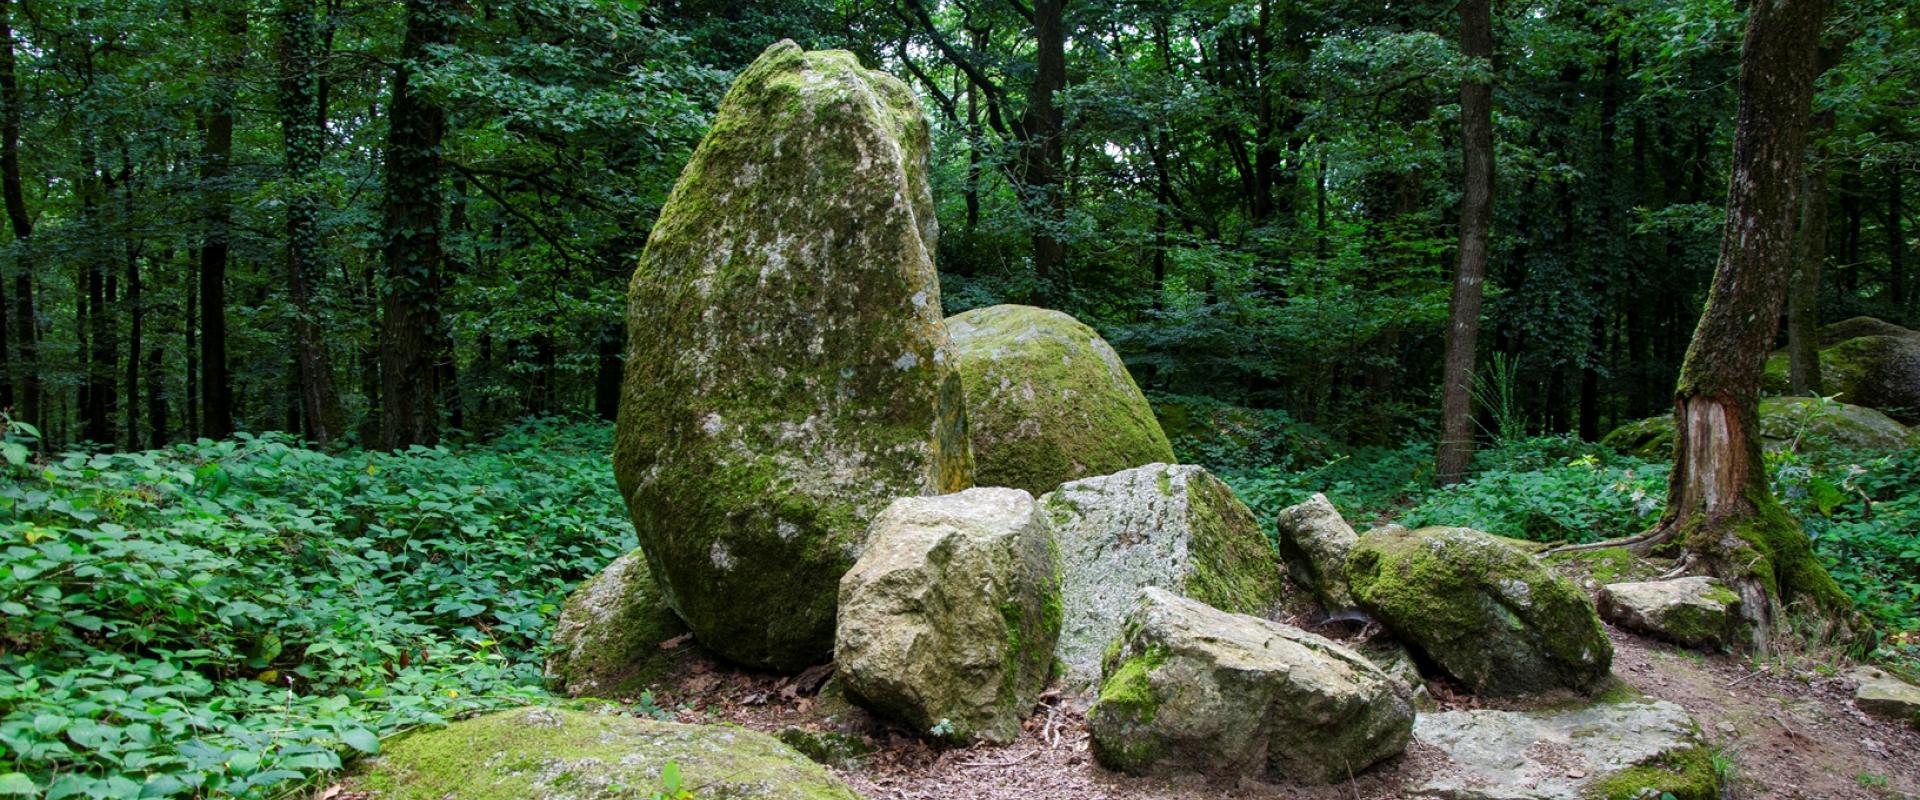 Randonnée au Bois du Tay à Hambers en Mayenne